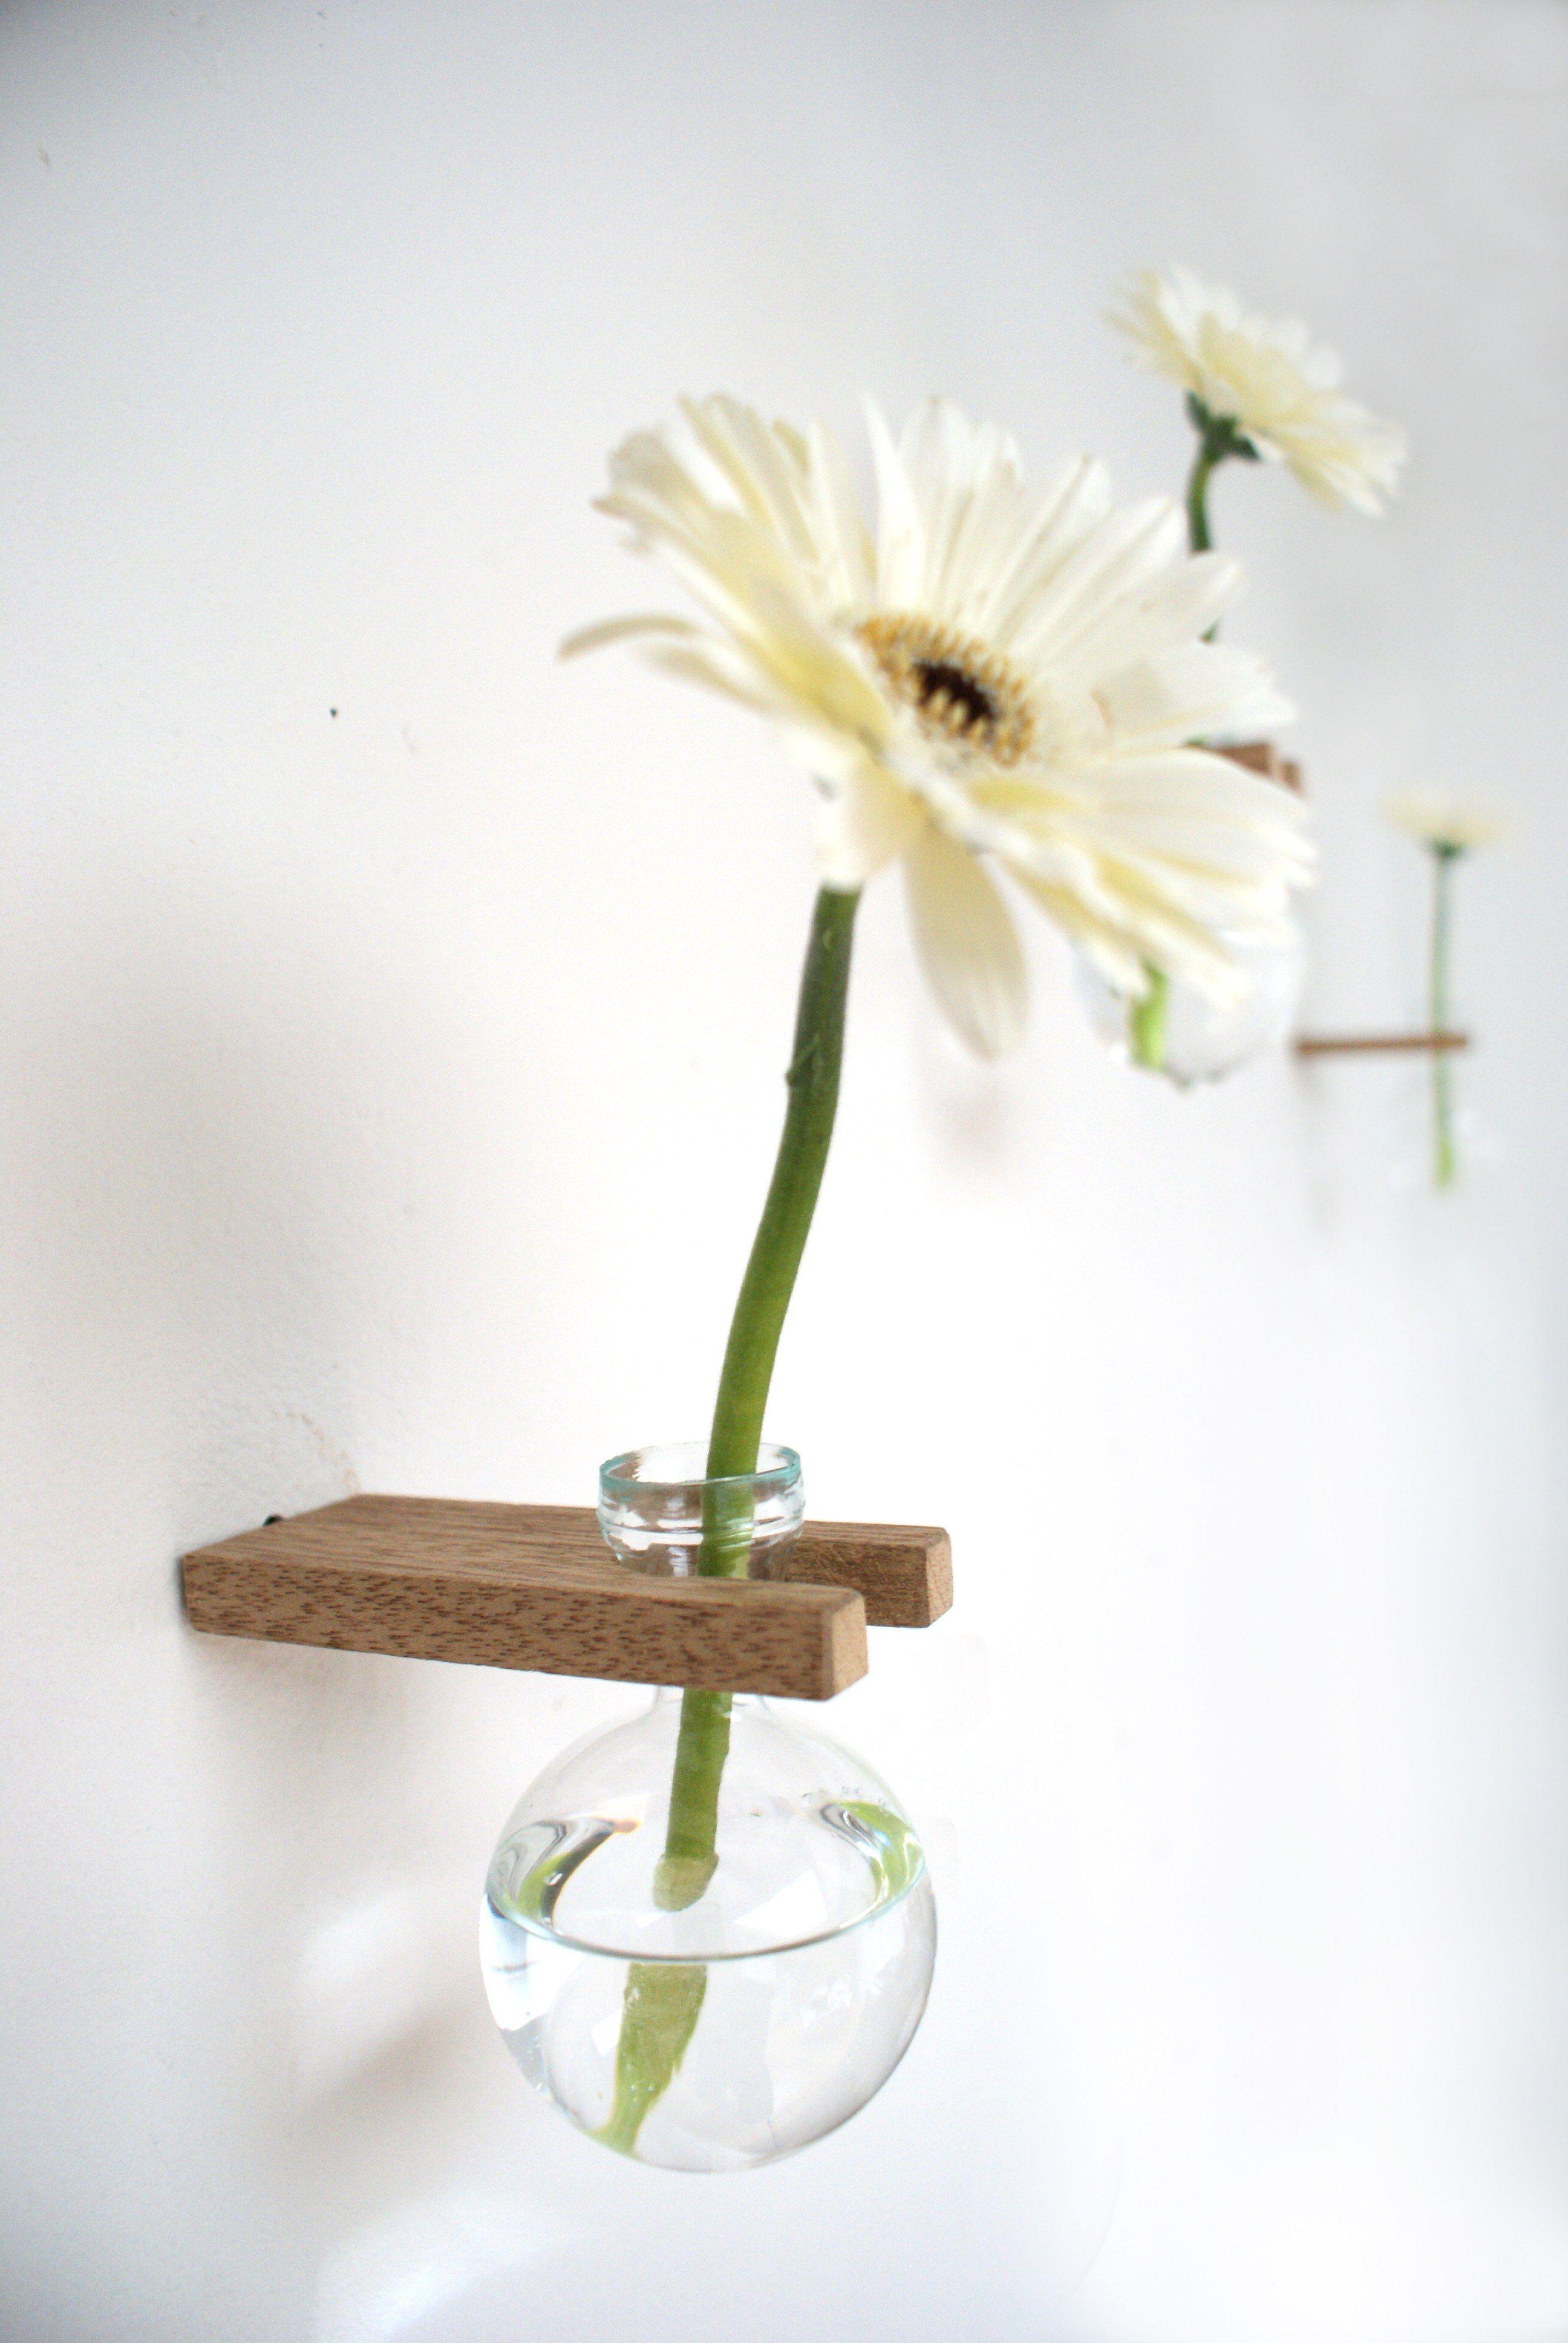 Blumenvase Vase Glasfläschchen Shabby Chic Vintage